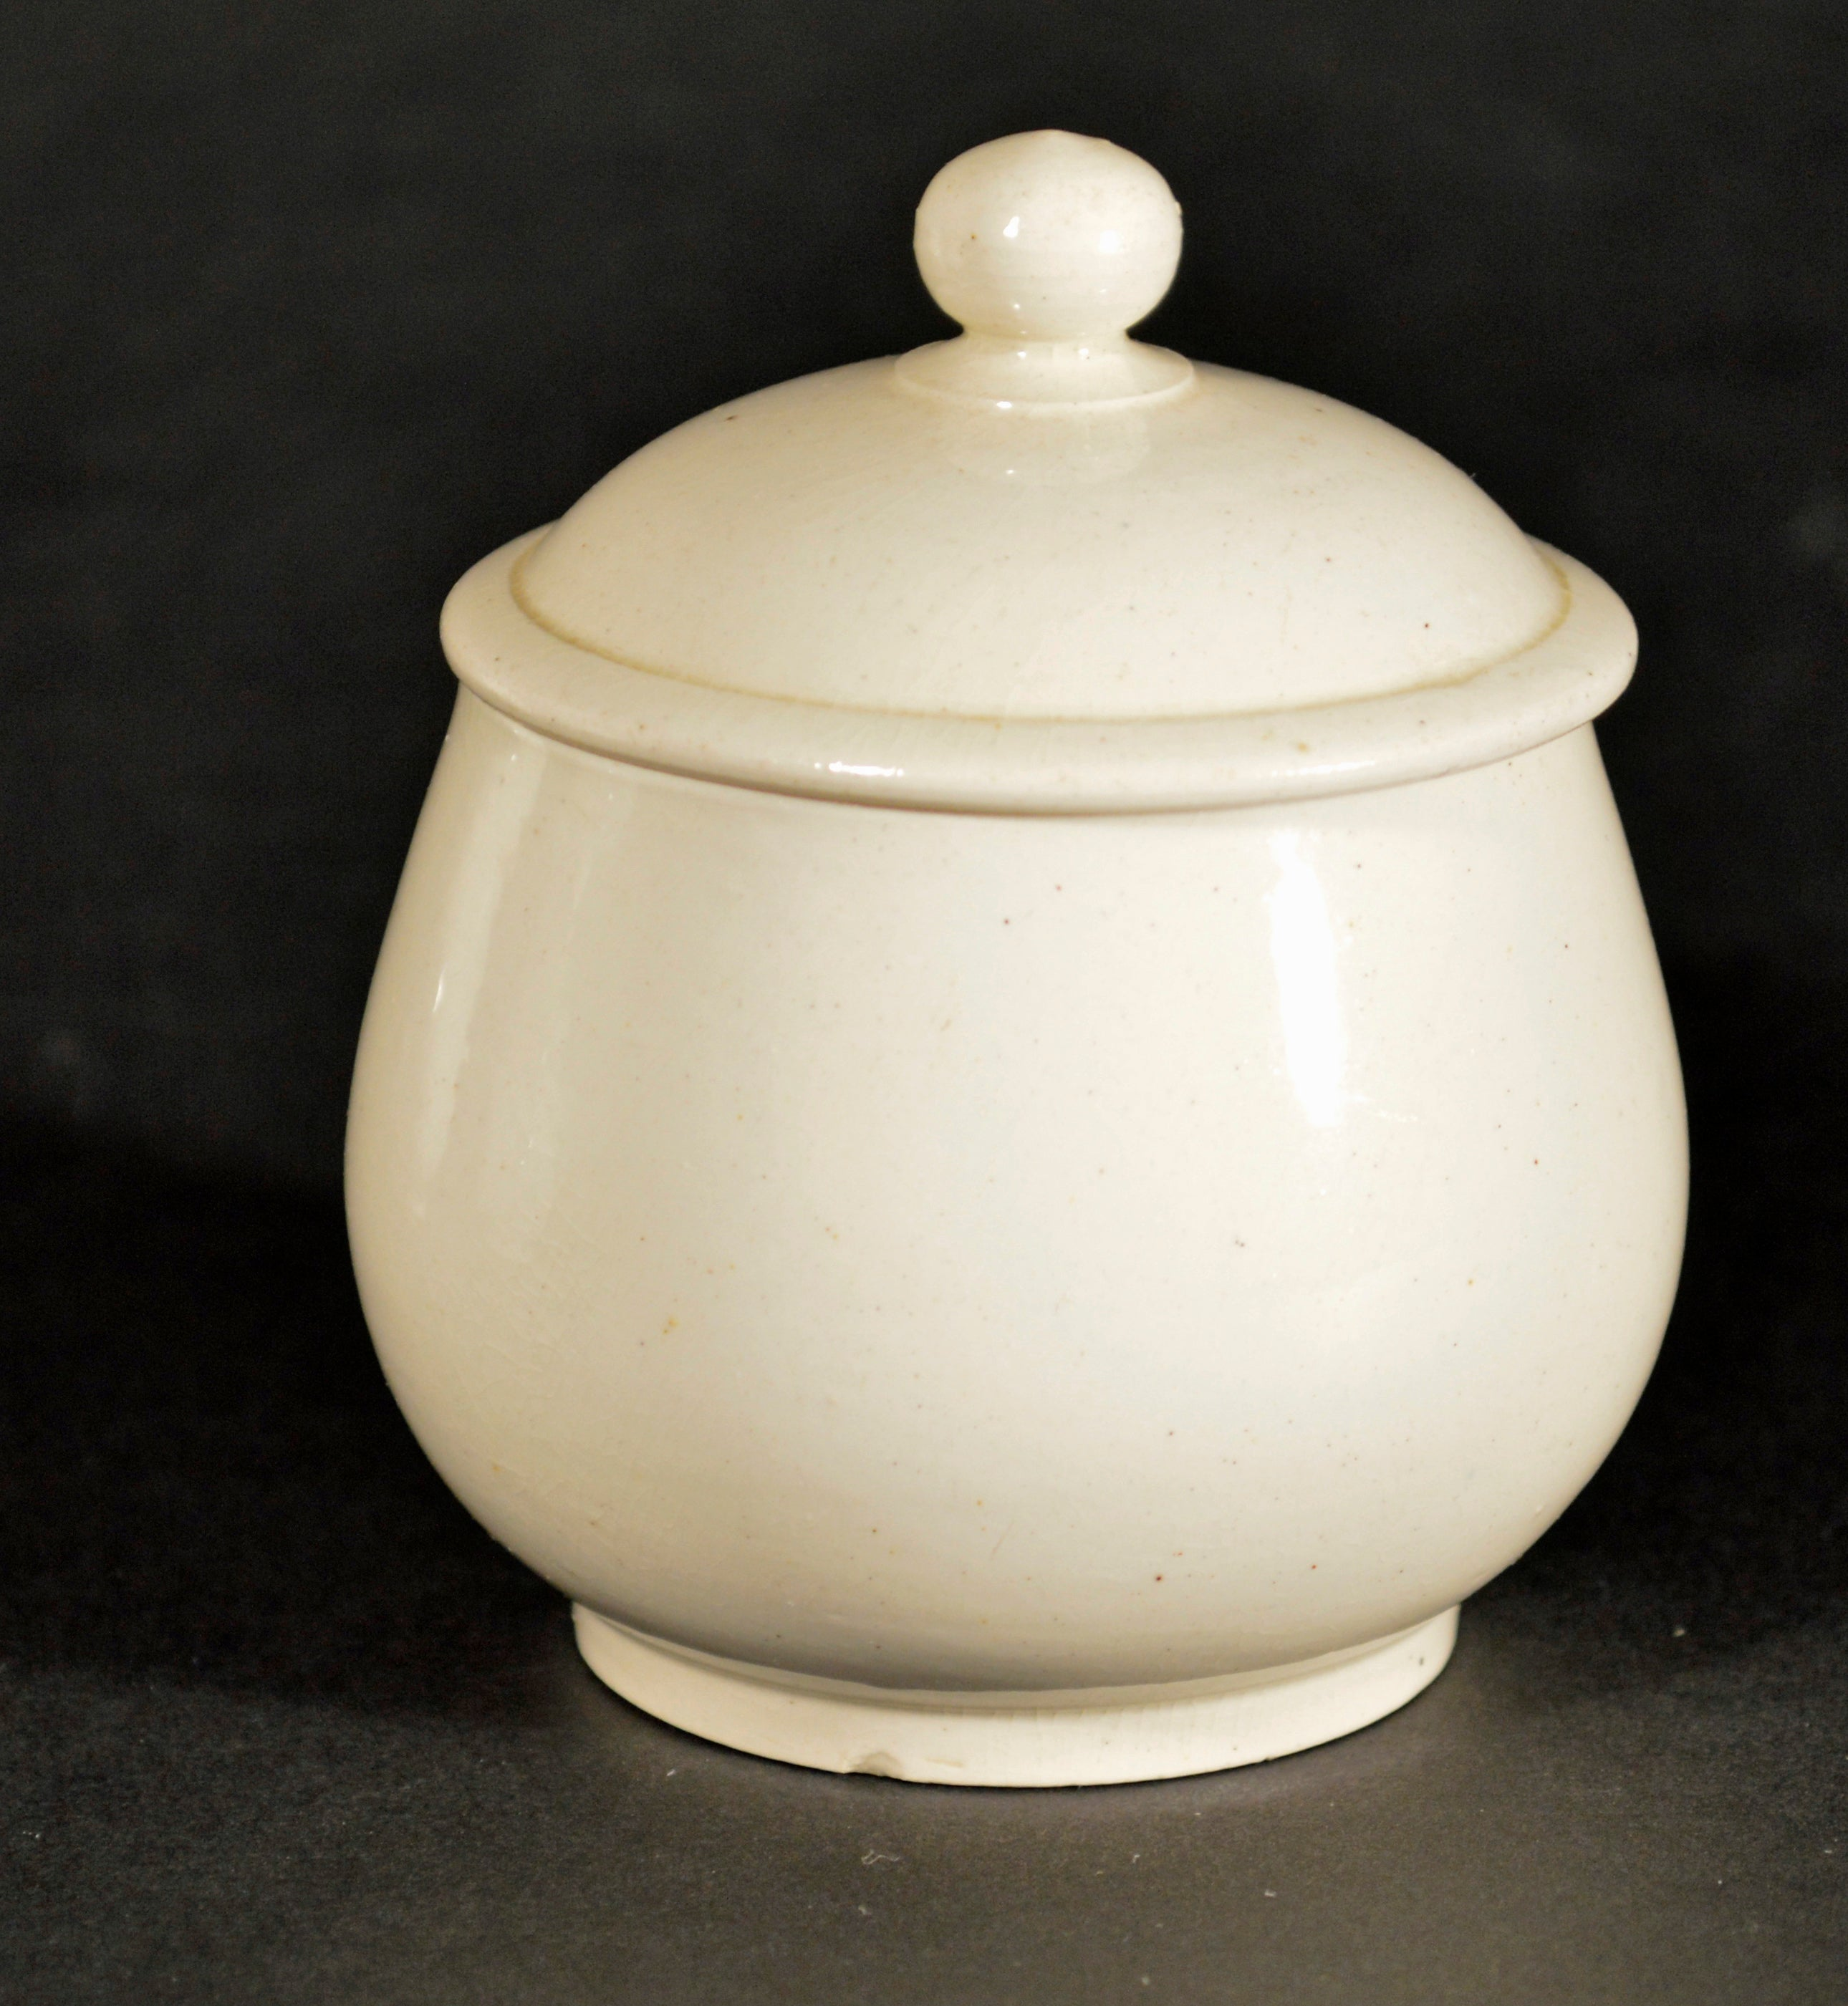 Creamers & Sugar Bowls Useful Antique Slip Molded Creamware Gravy Boat Bowl 18th Century